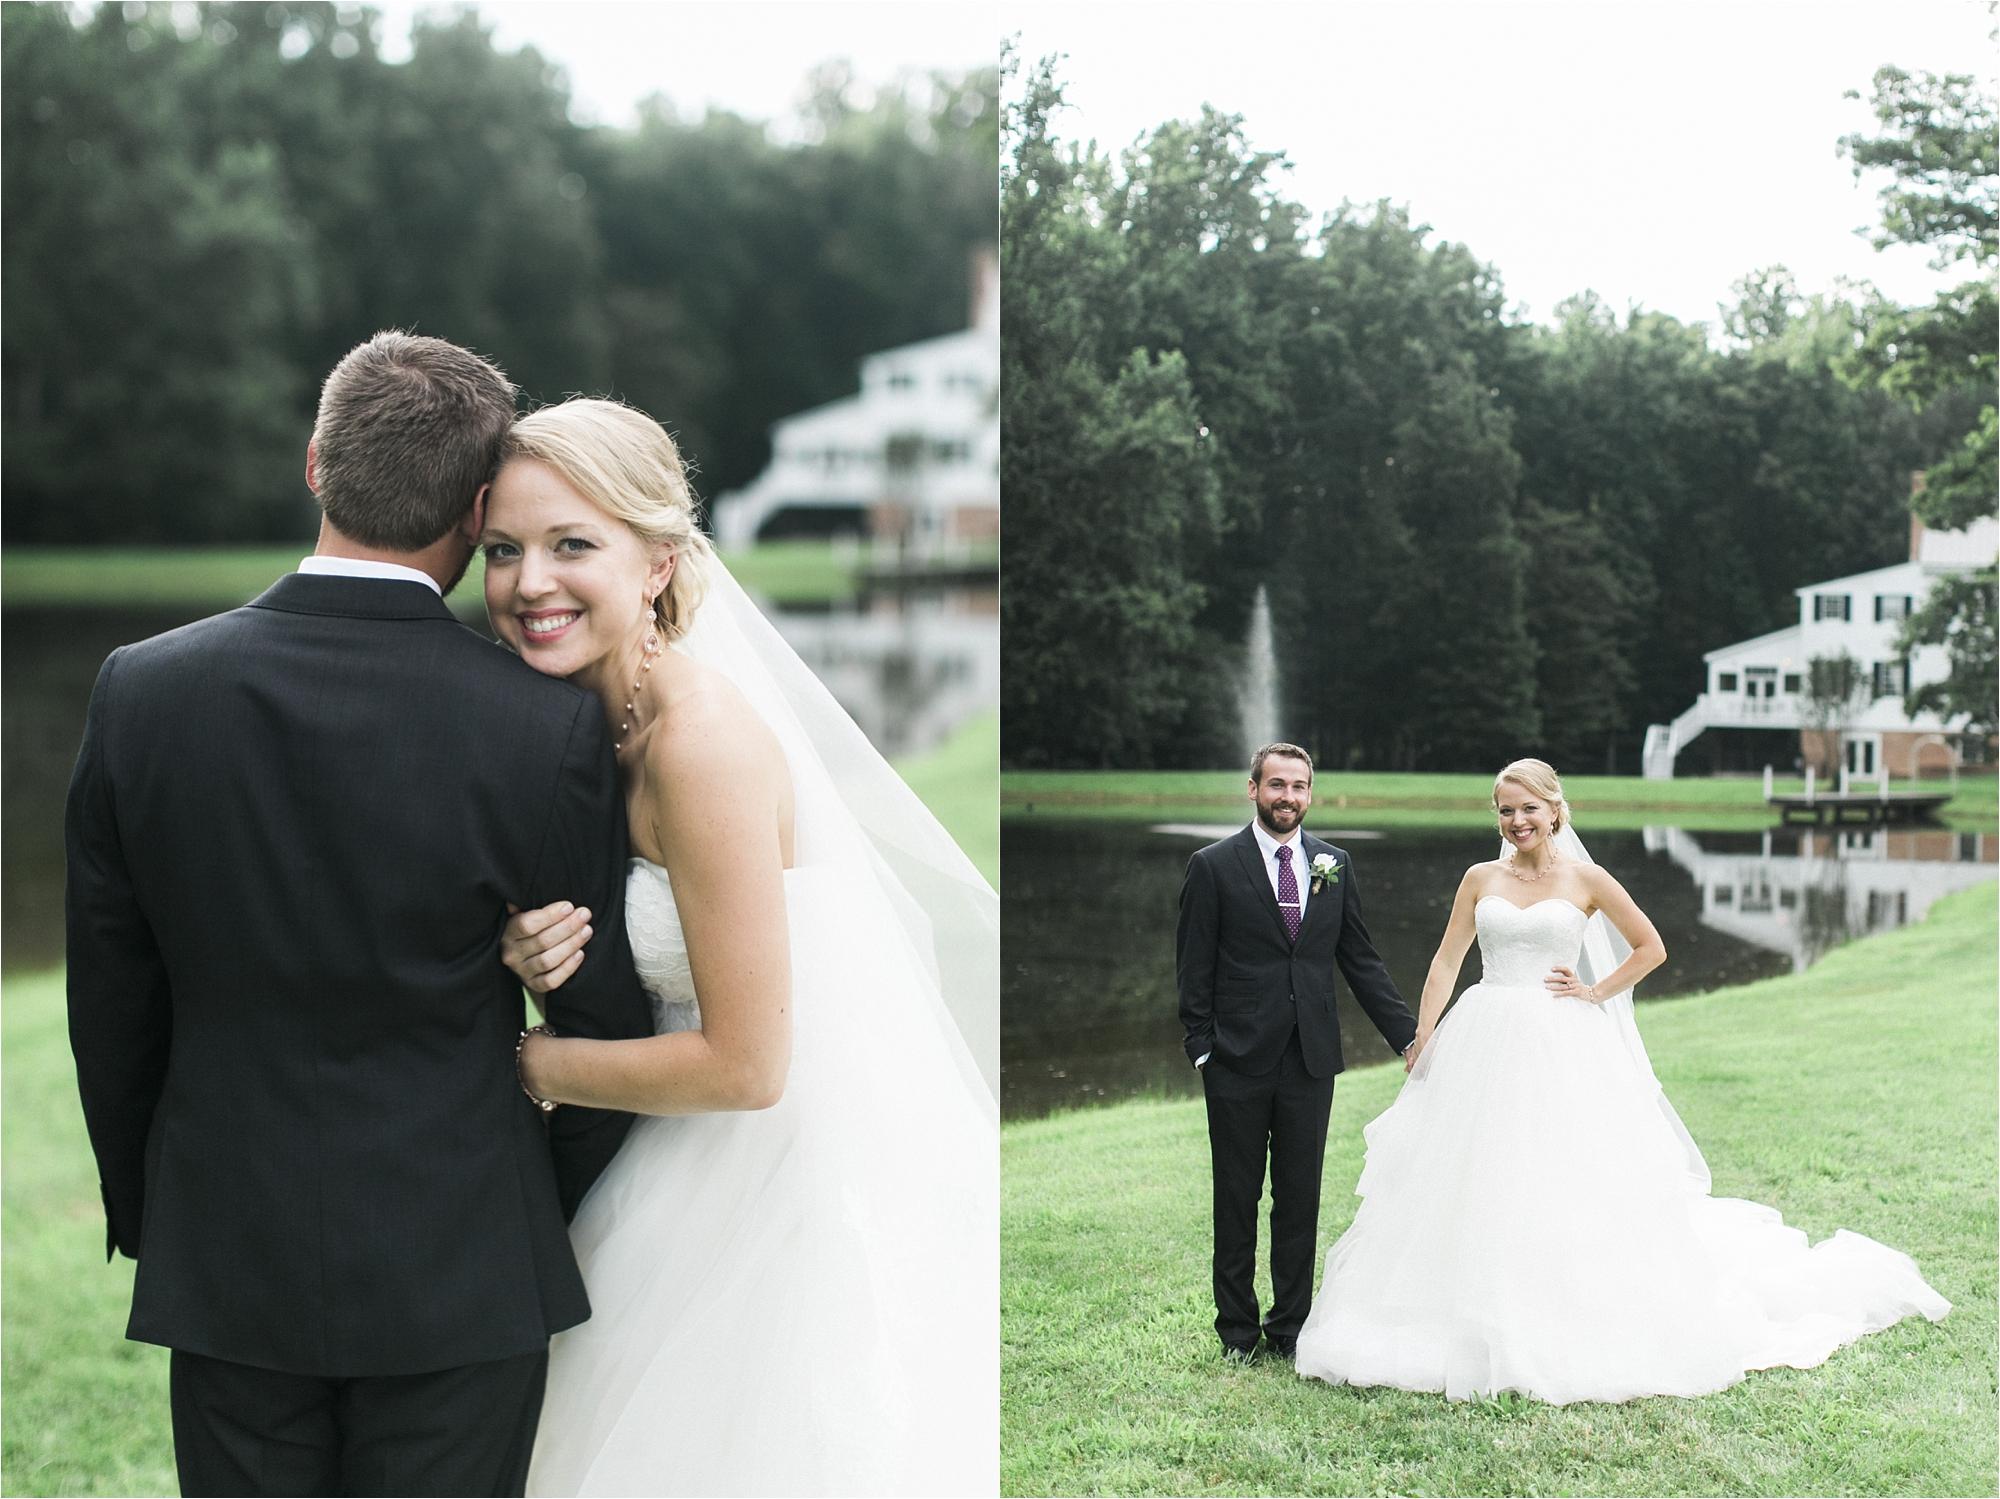 fredericksburg-virginia-stevenson-ridge-wedding-stephanie-yonce-photo_0034.jpg